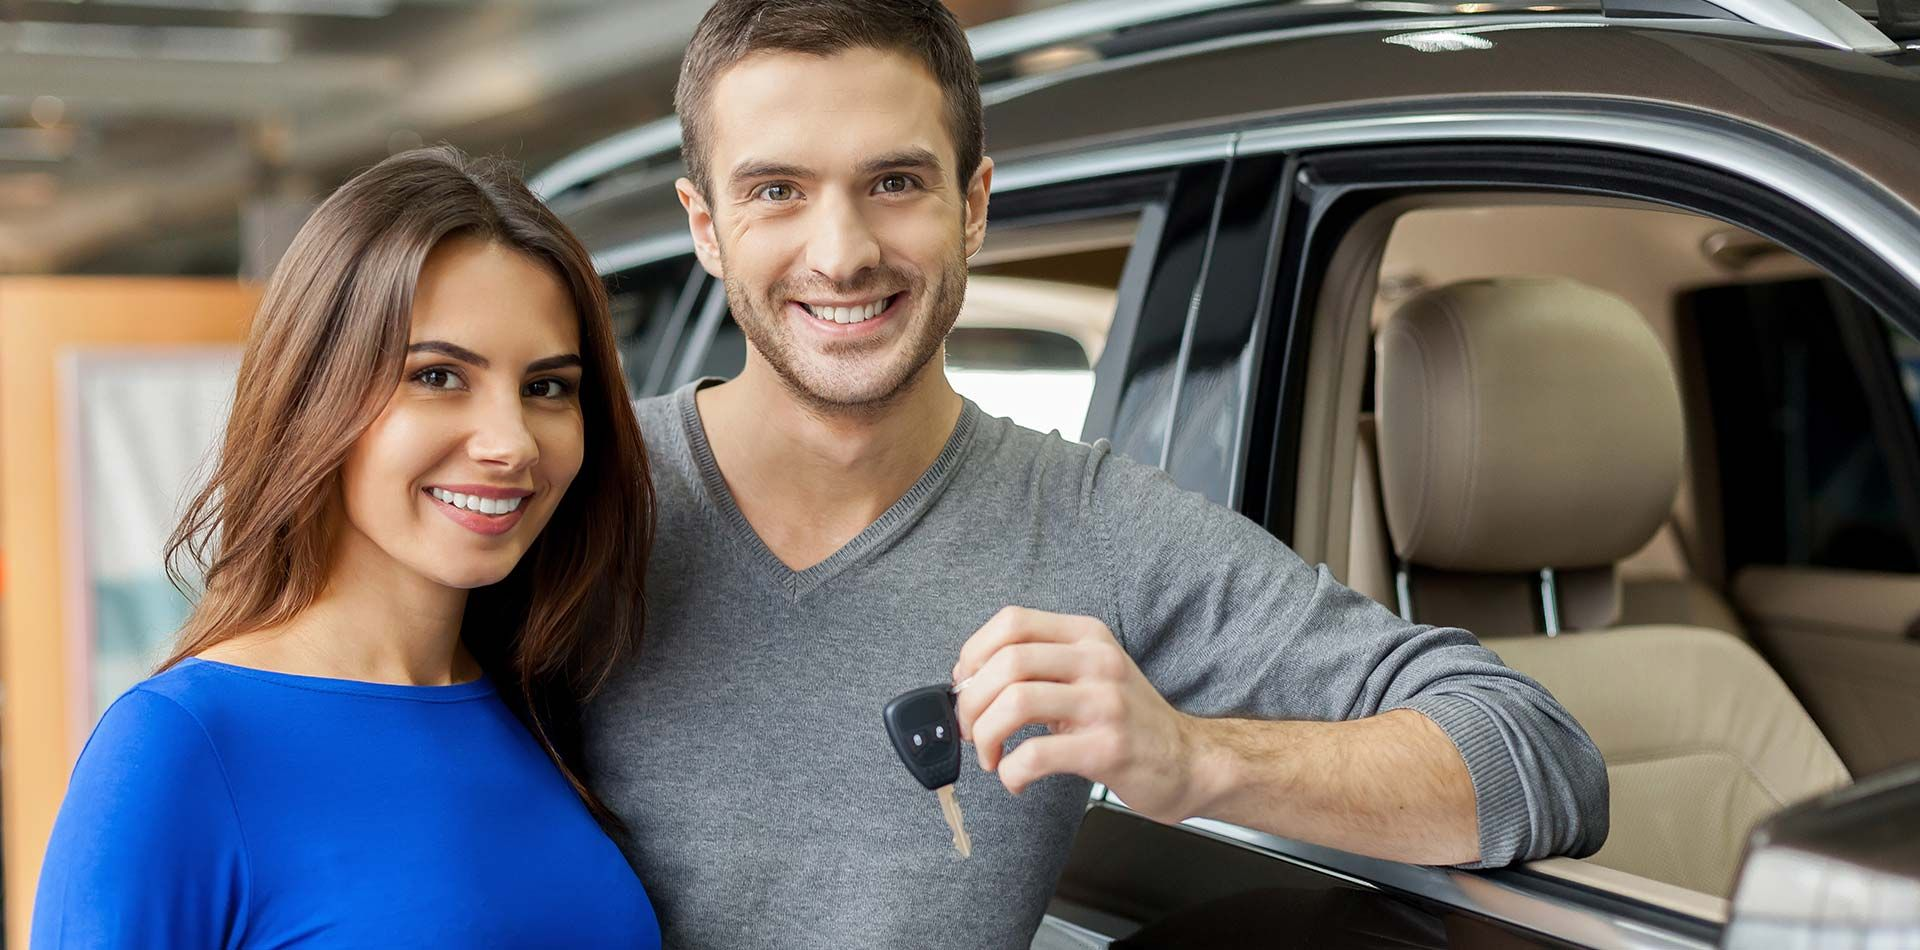 Evans Insurance has been providing world class auto